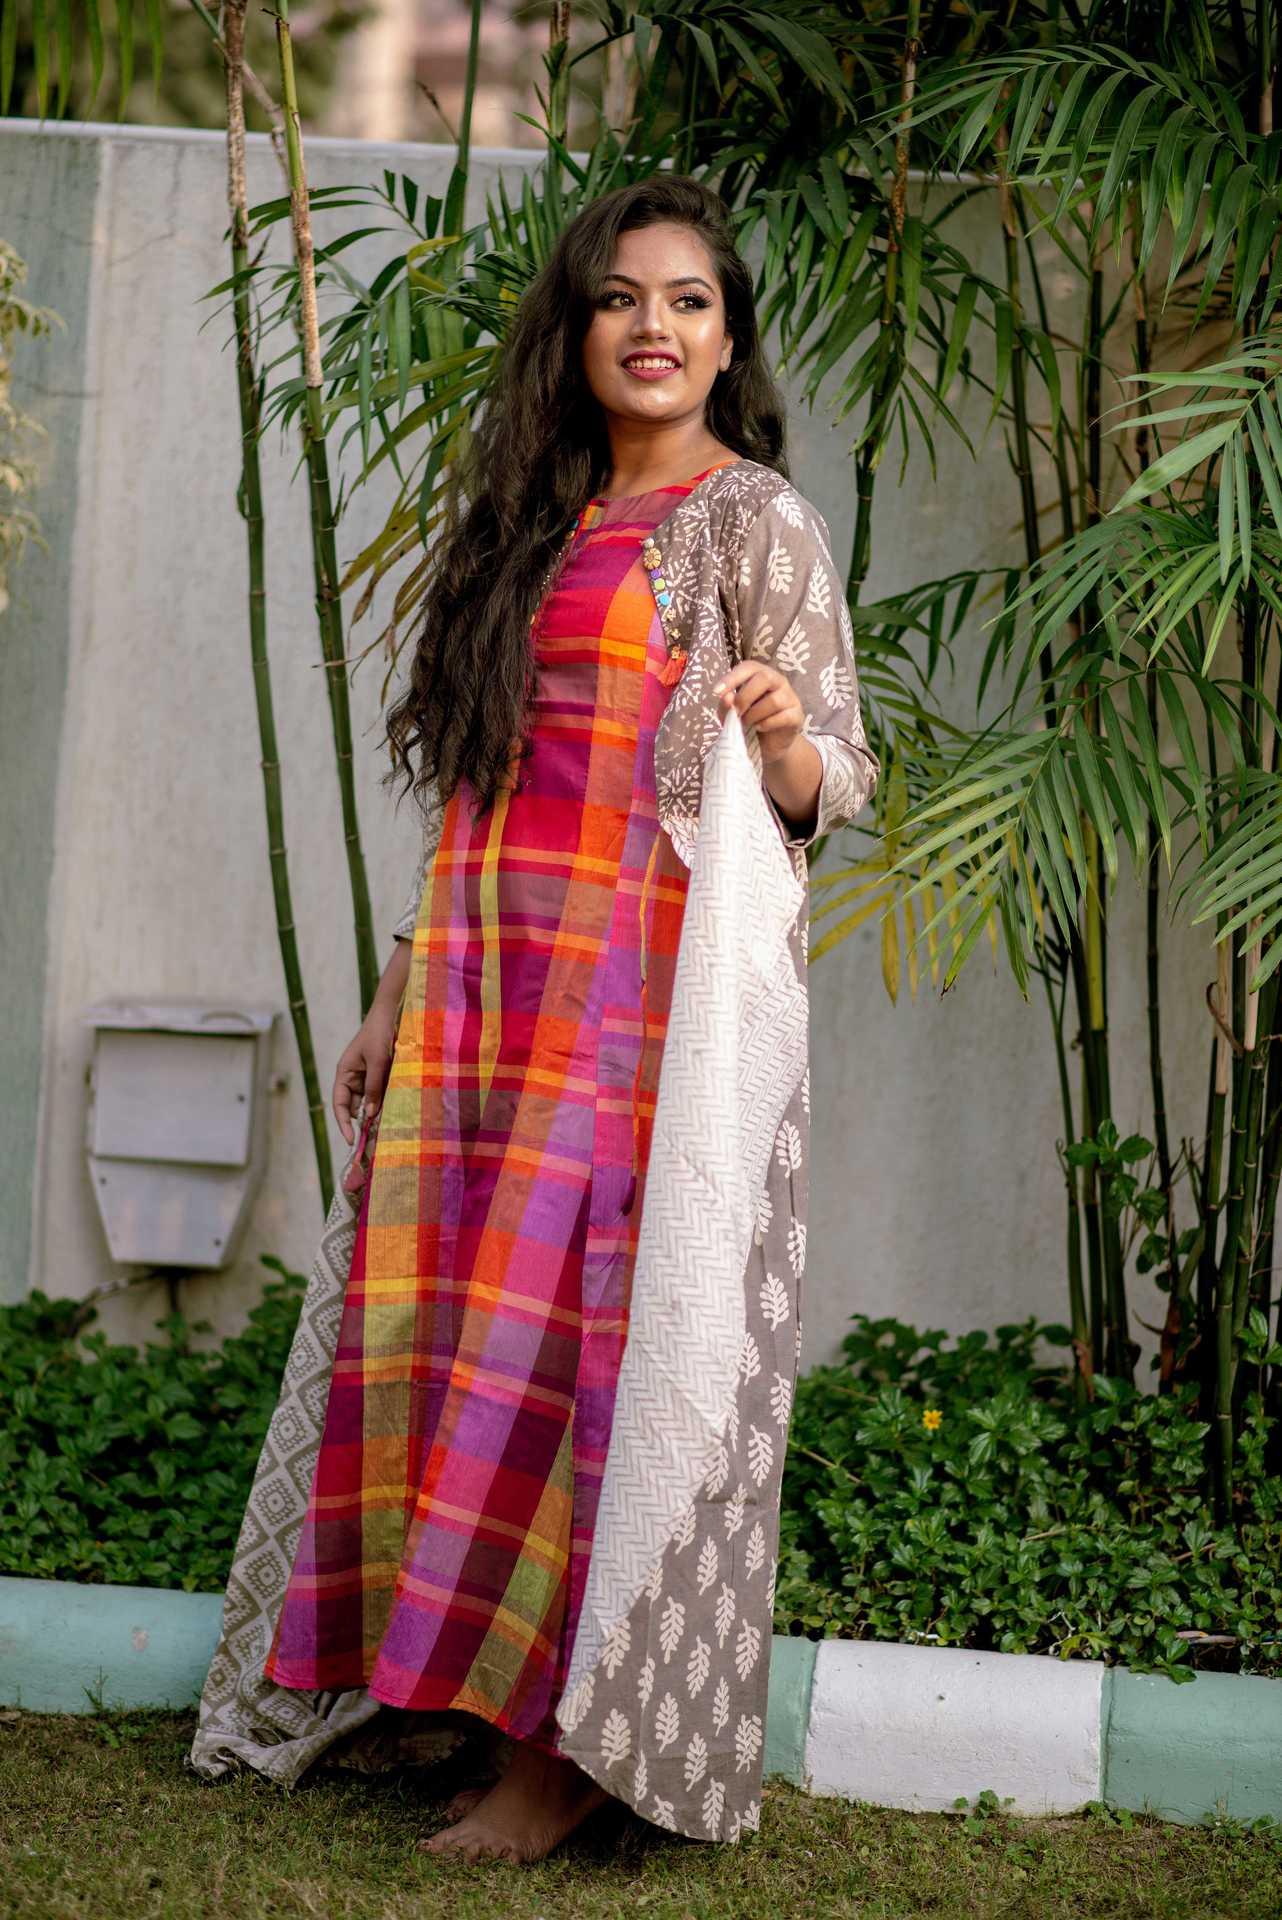 The Fashion Curve by Madhurima - _DSC9292